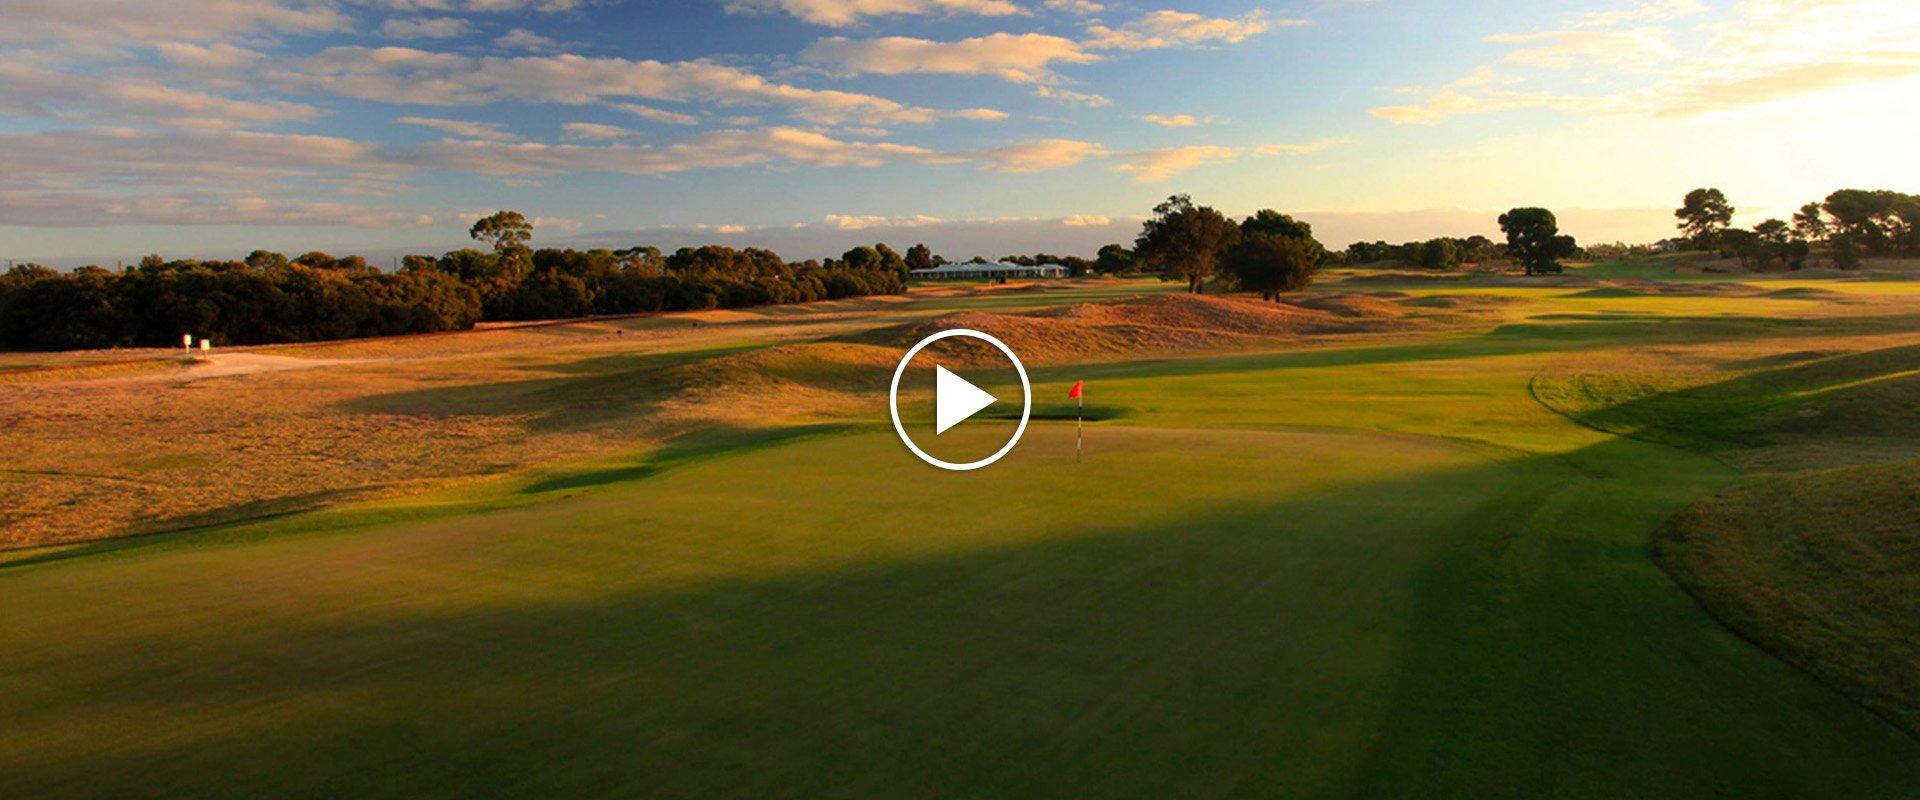 Royal Adelaide Golf Club, Adelaide